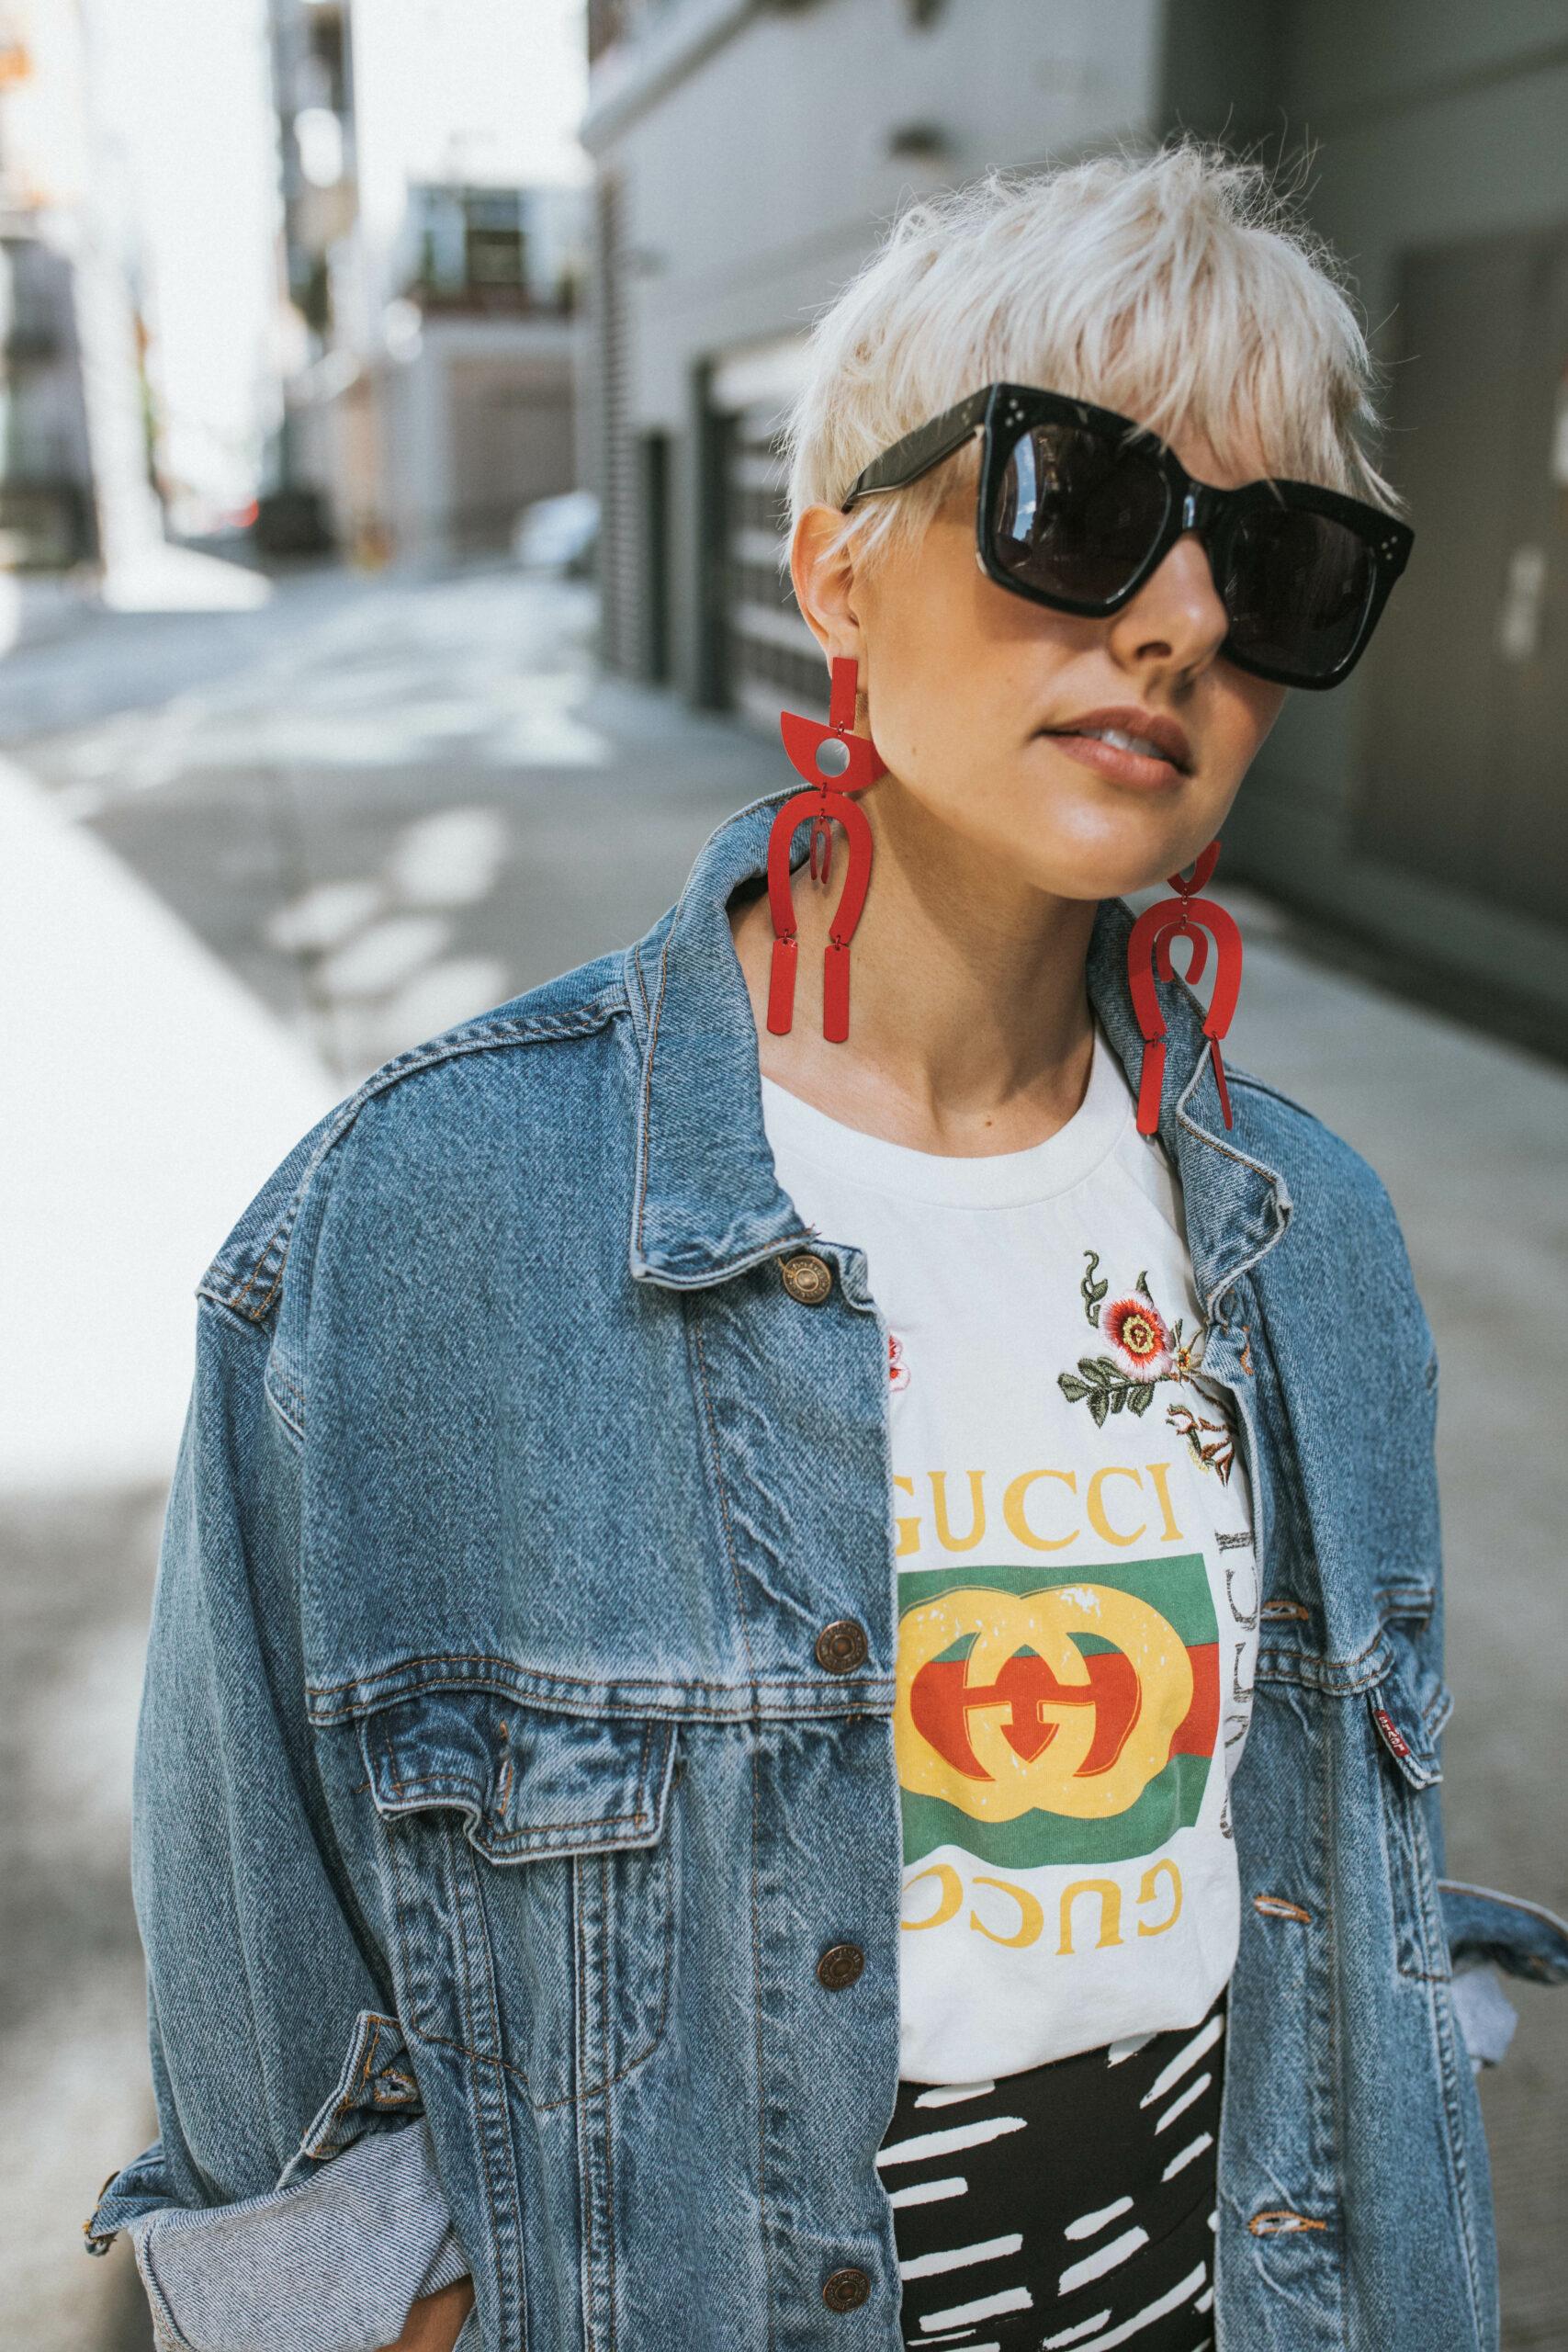 Mango Earrings, Gucci Tee, Celine Sunnies- BloggerNotBillionaire.com